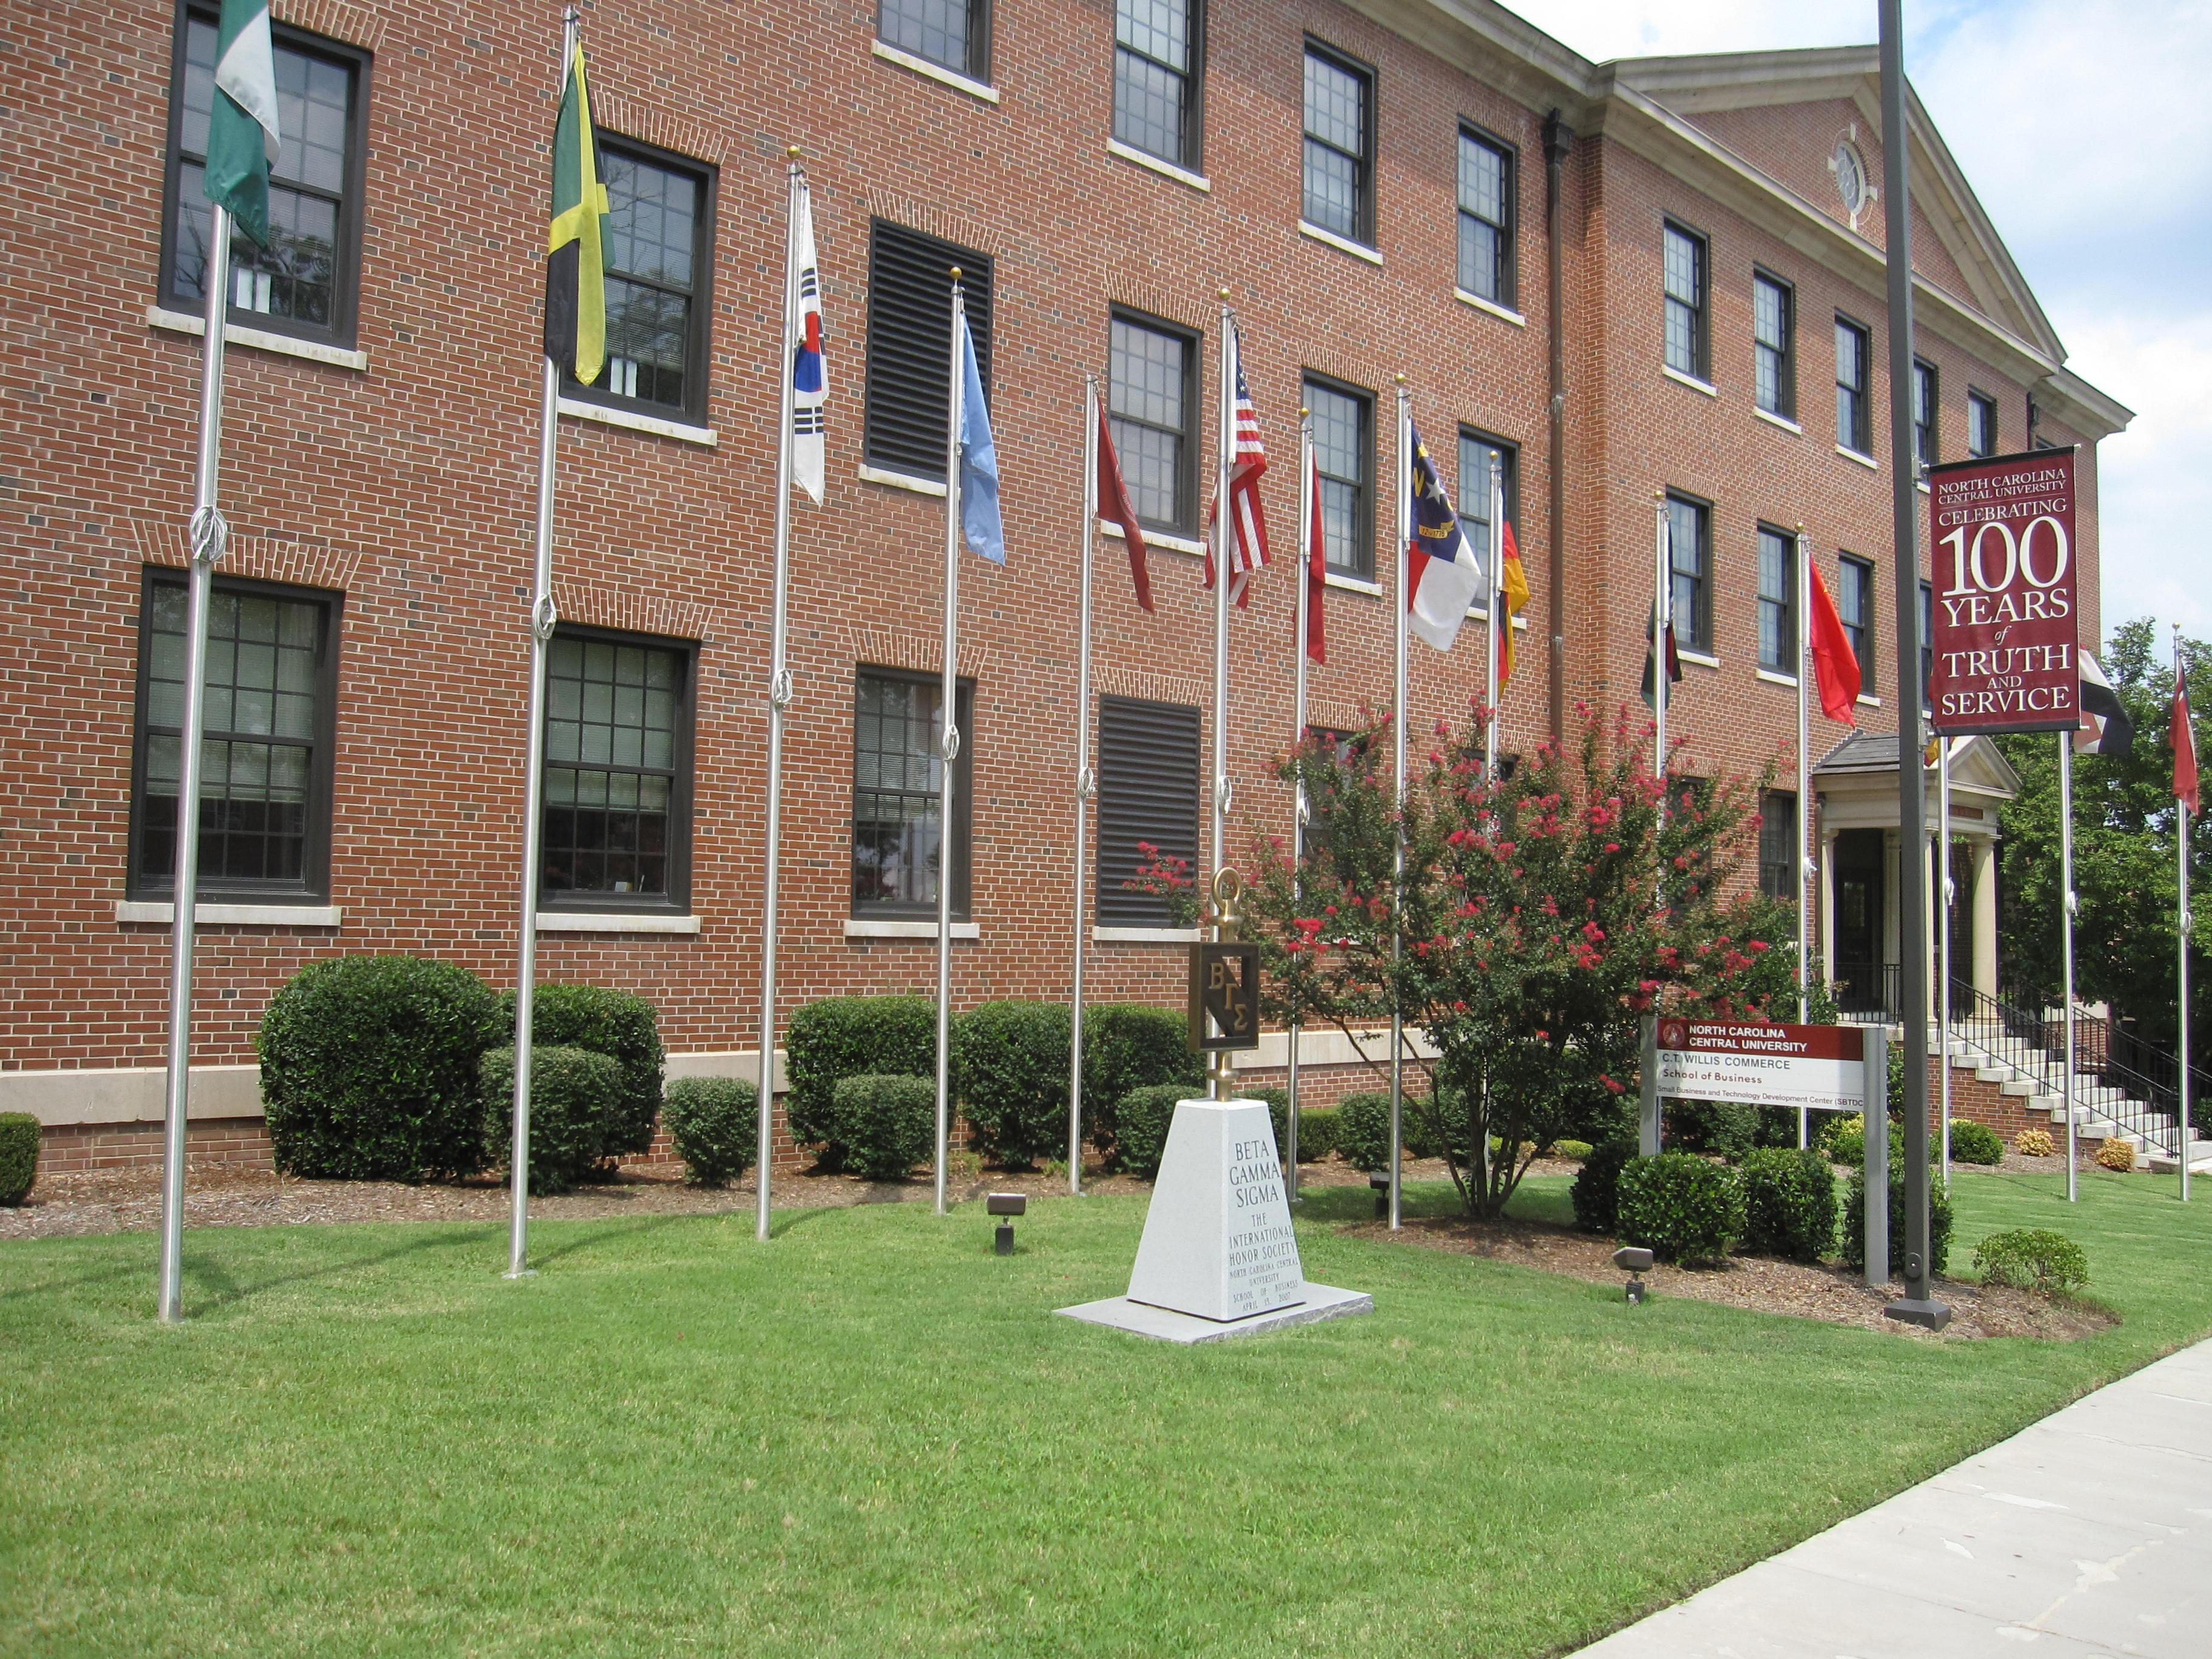 North Carolina Central University 2015 | Personal Blog